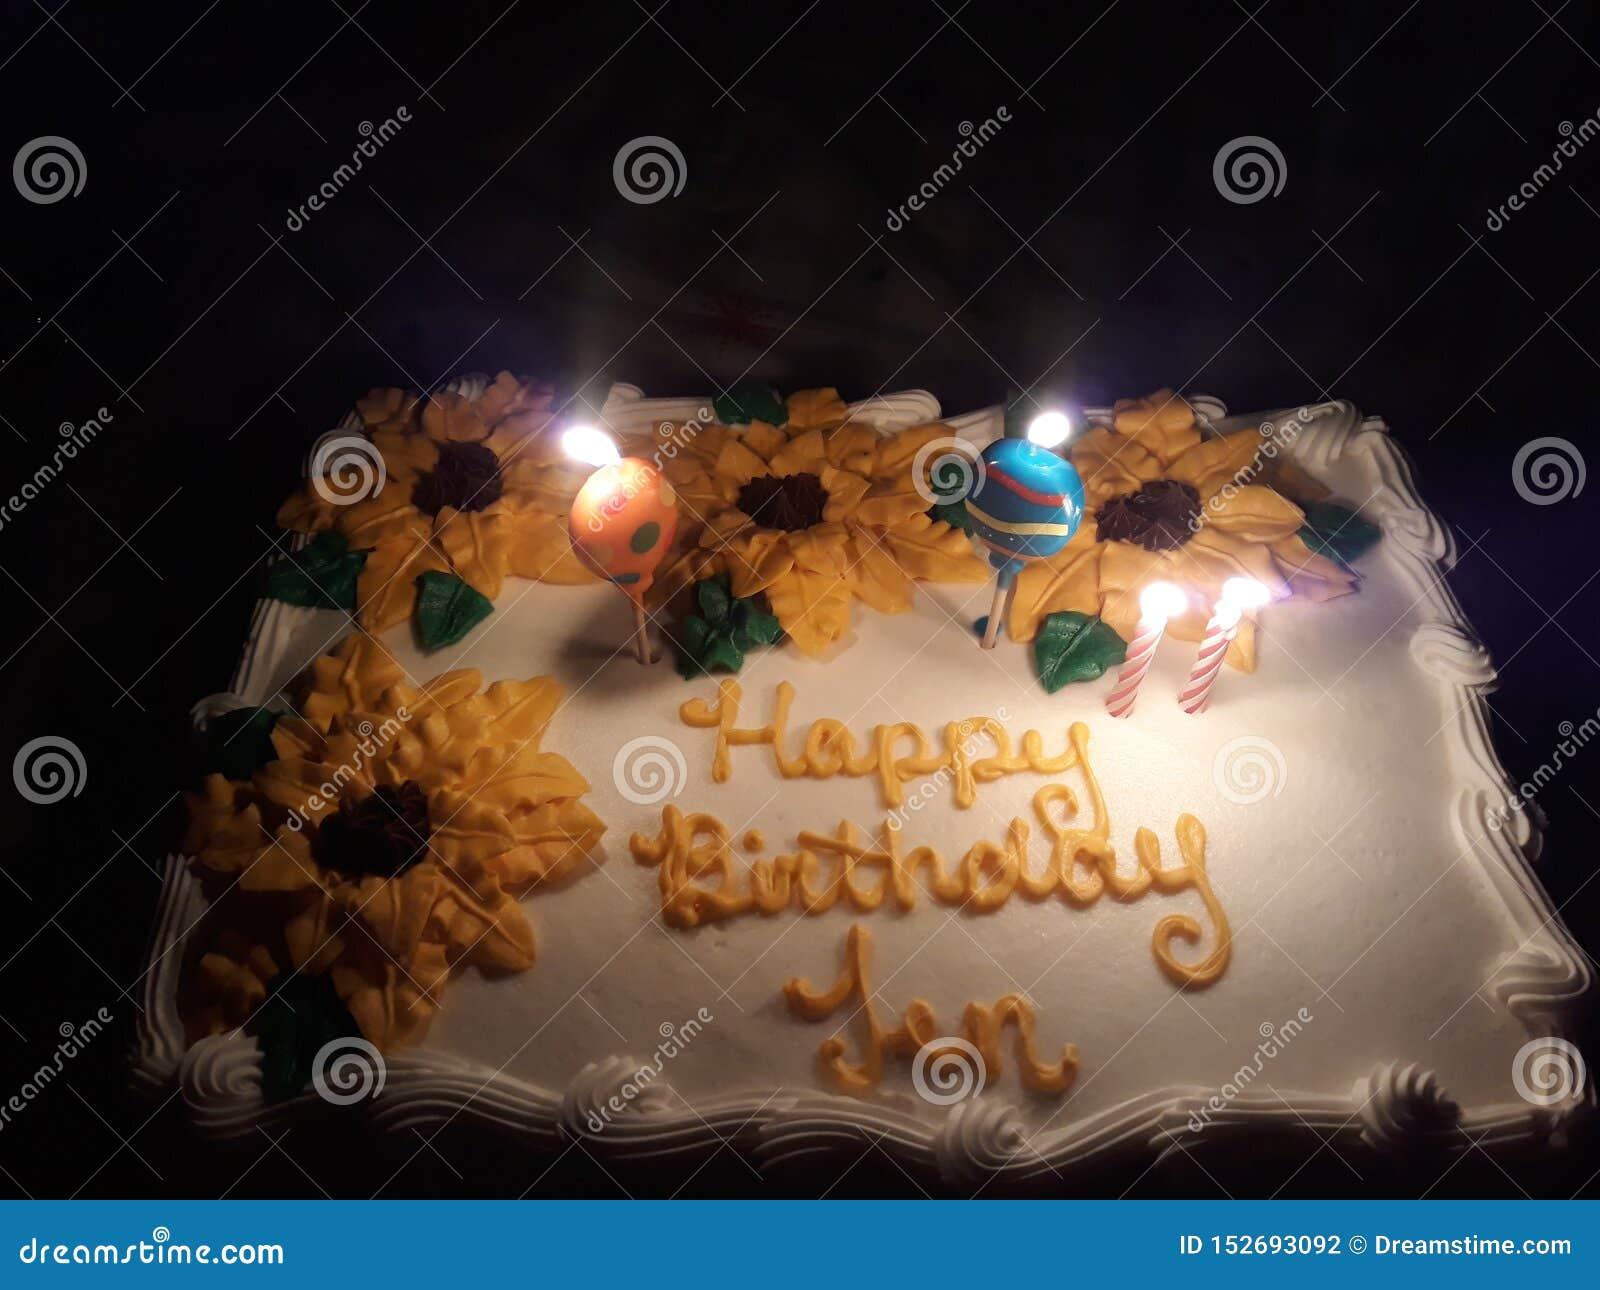 Alles Gute zum Geburtstag Jen